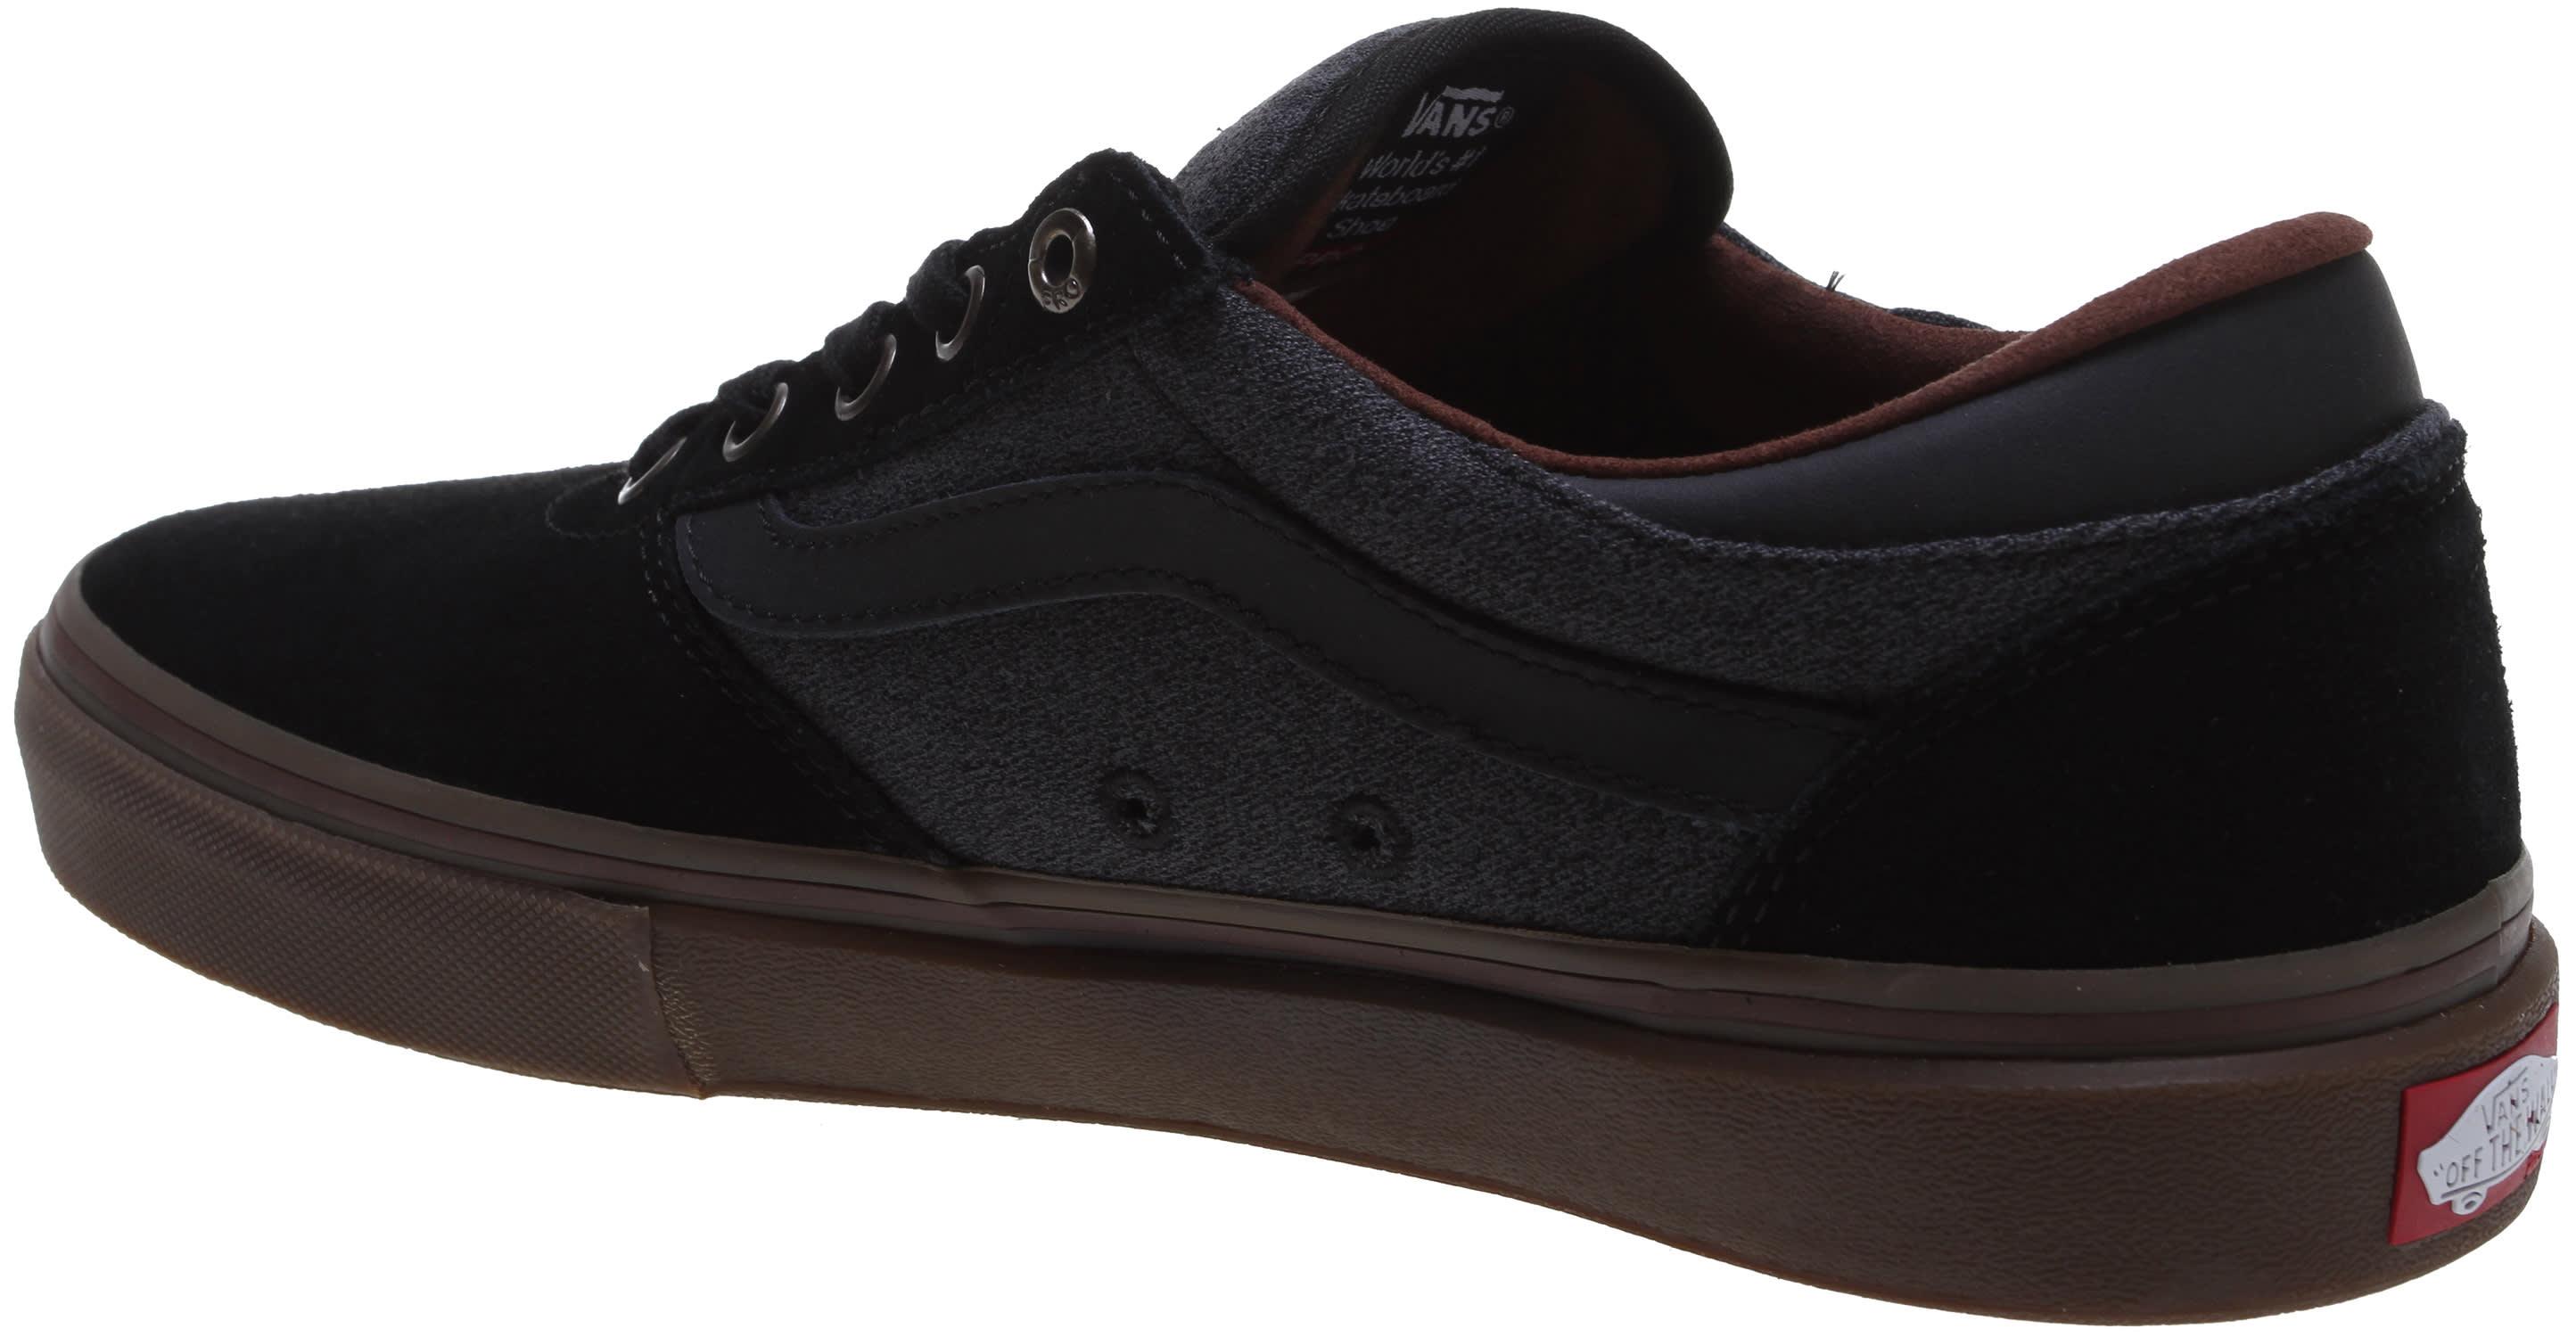 On Sale Vans Gilbert Crockett Pro Skate Shoes up to 50% off